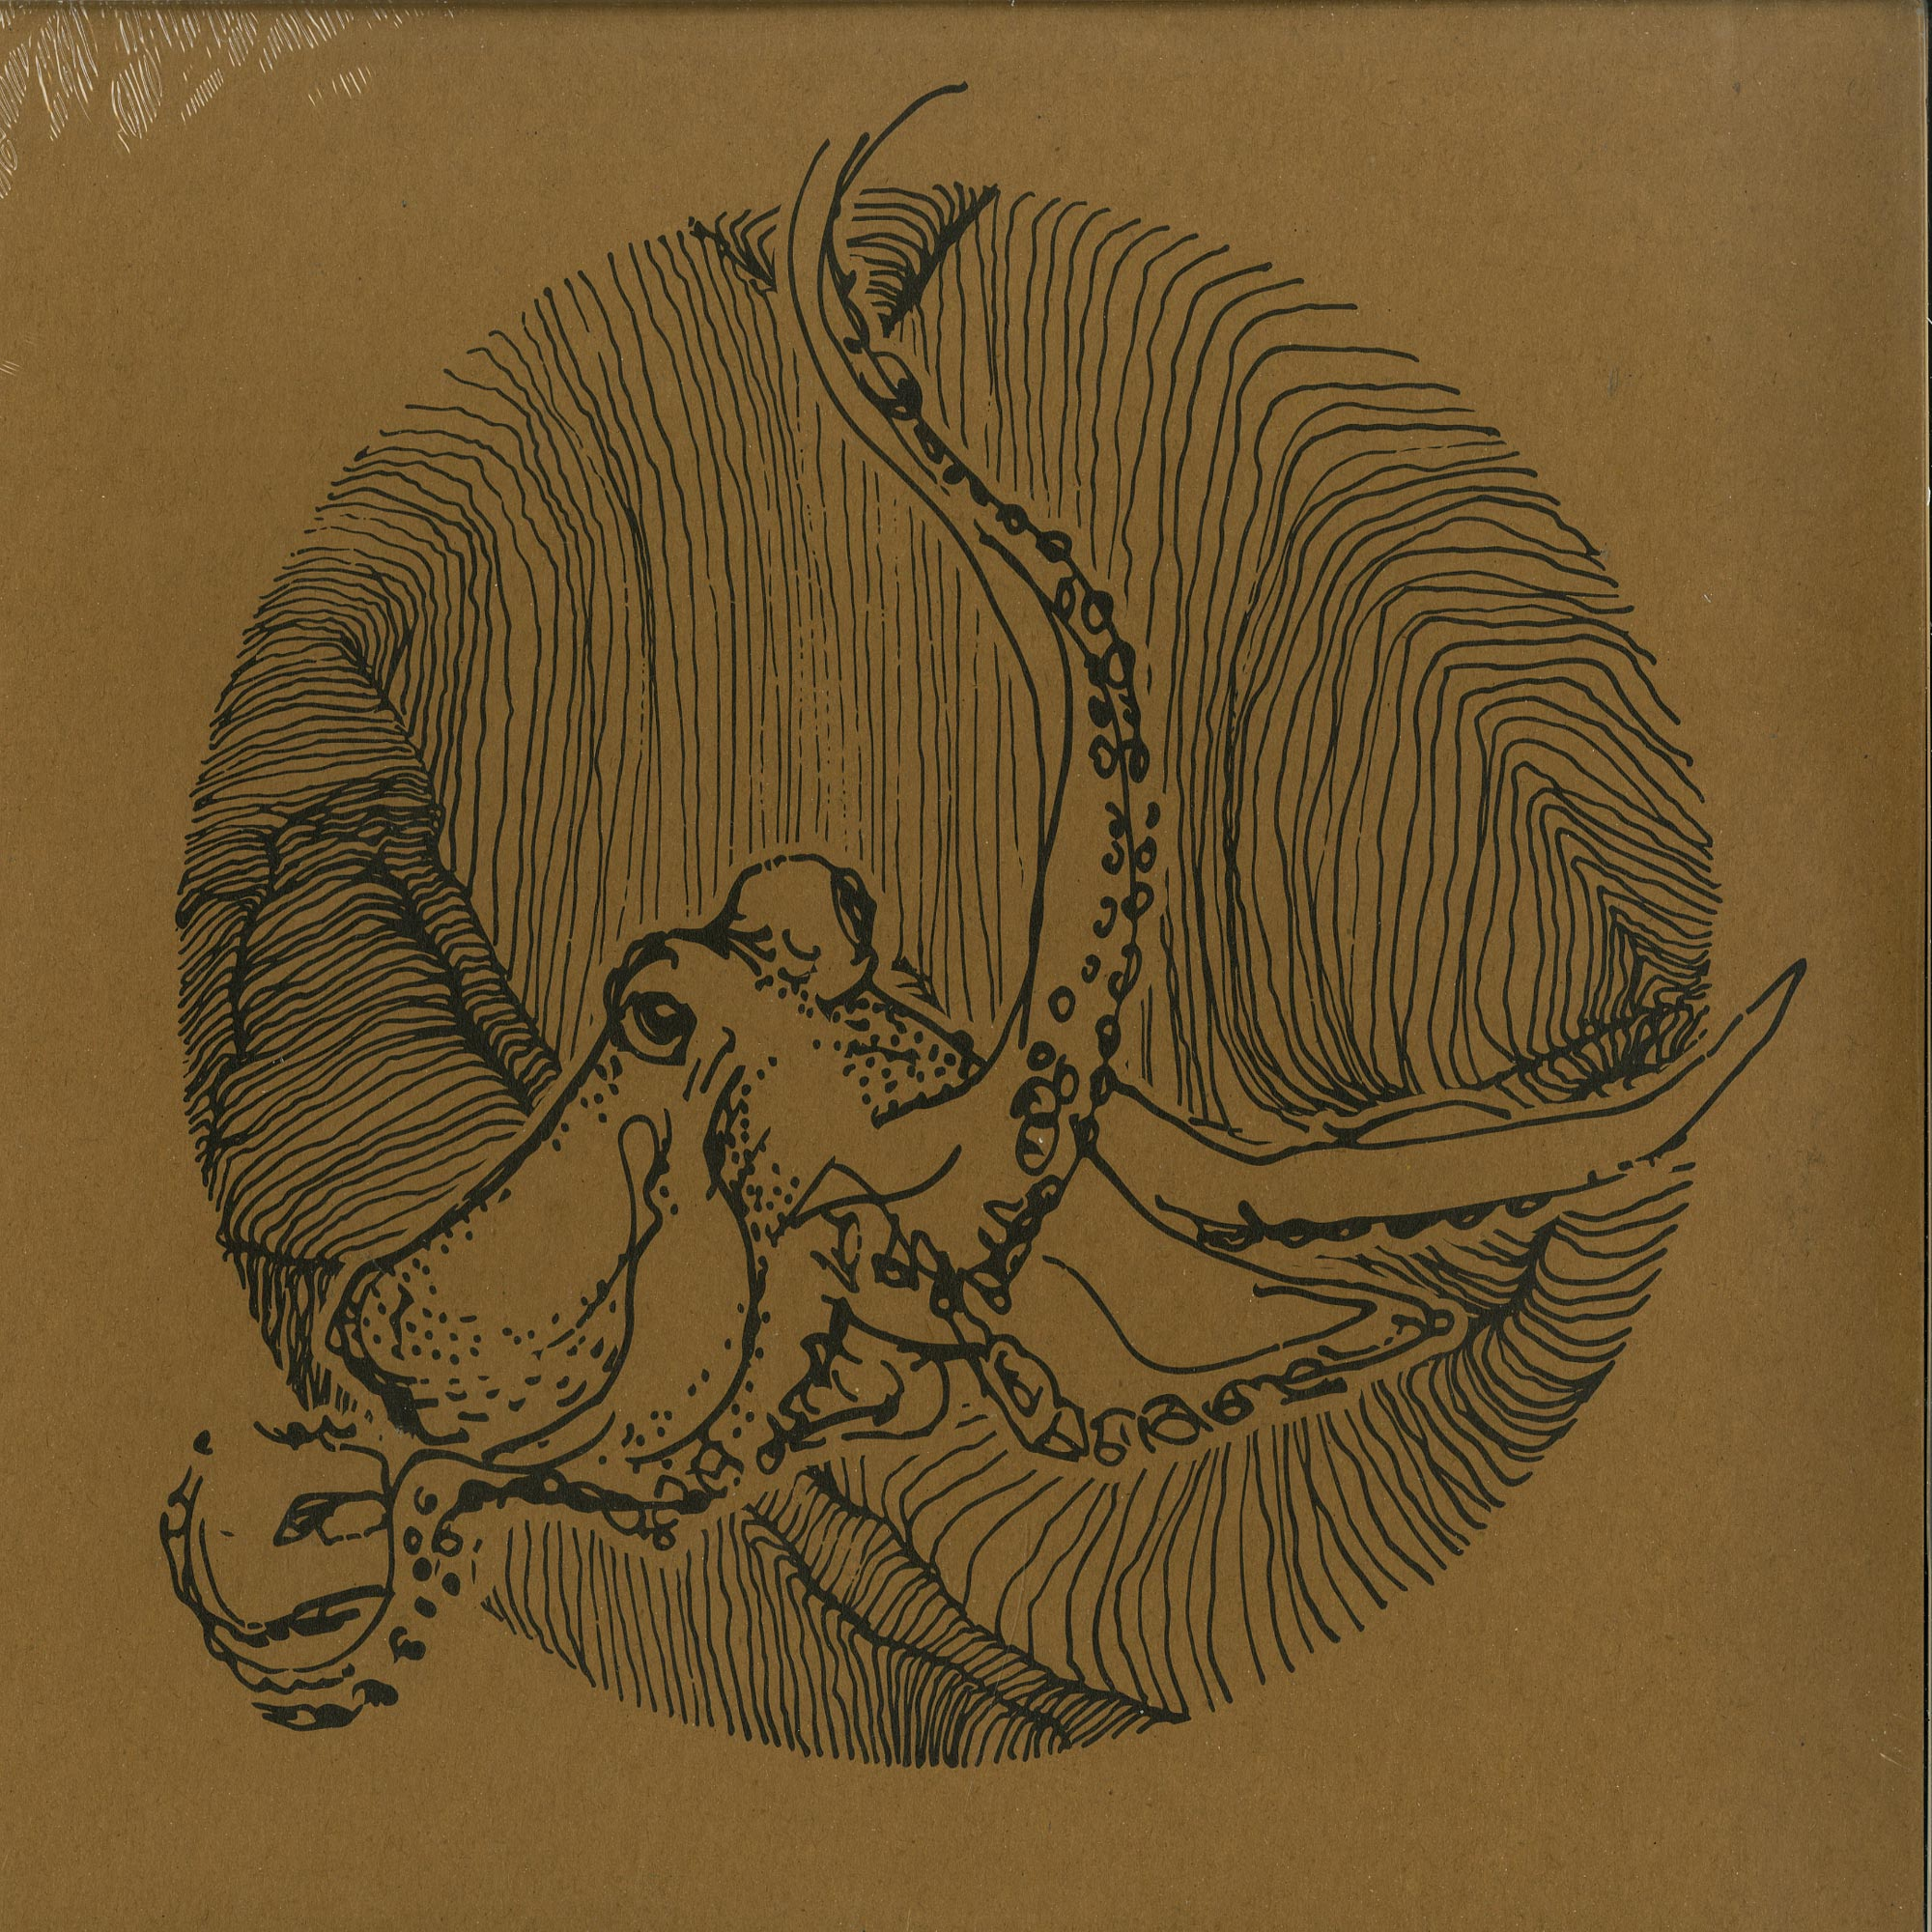 Star_Dub - DELICIOUS DUB EP